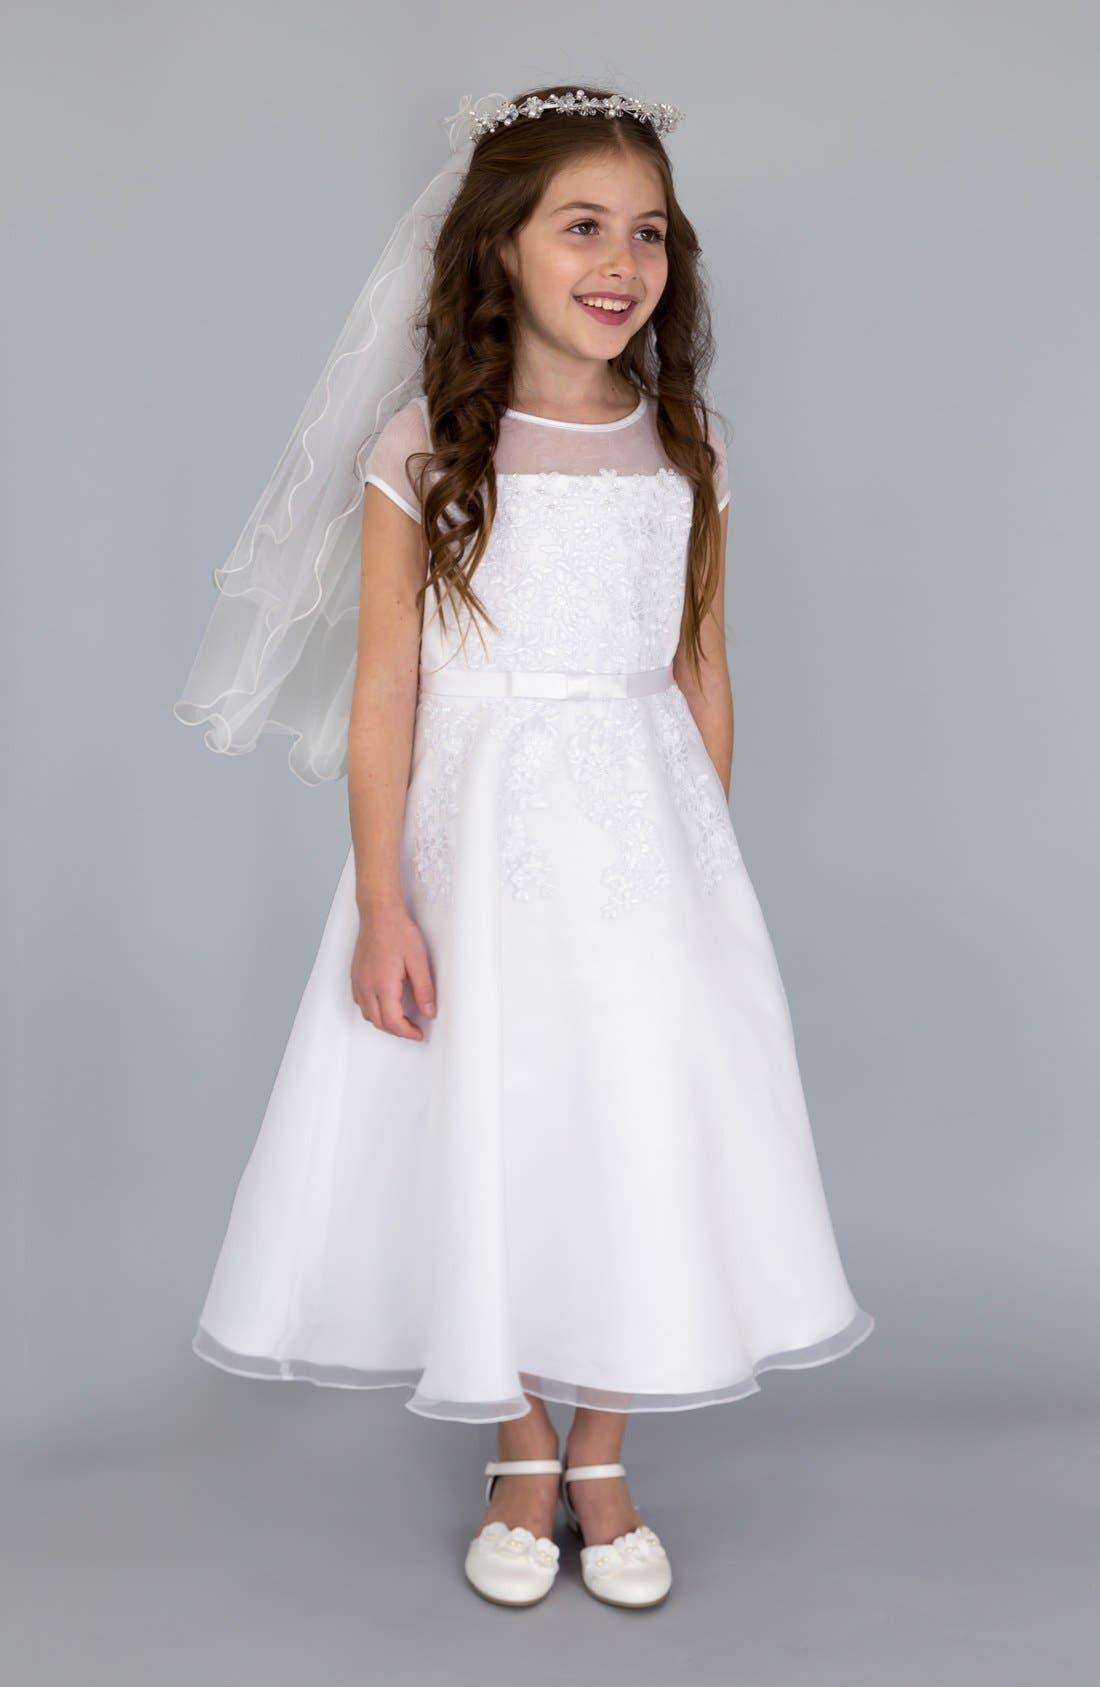 Where to Buy Communion Dress